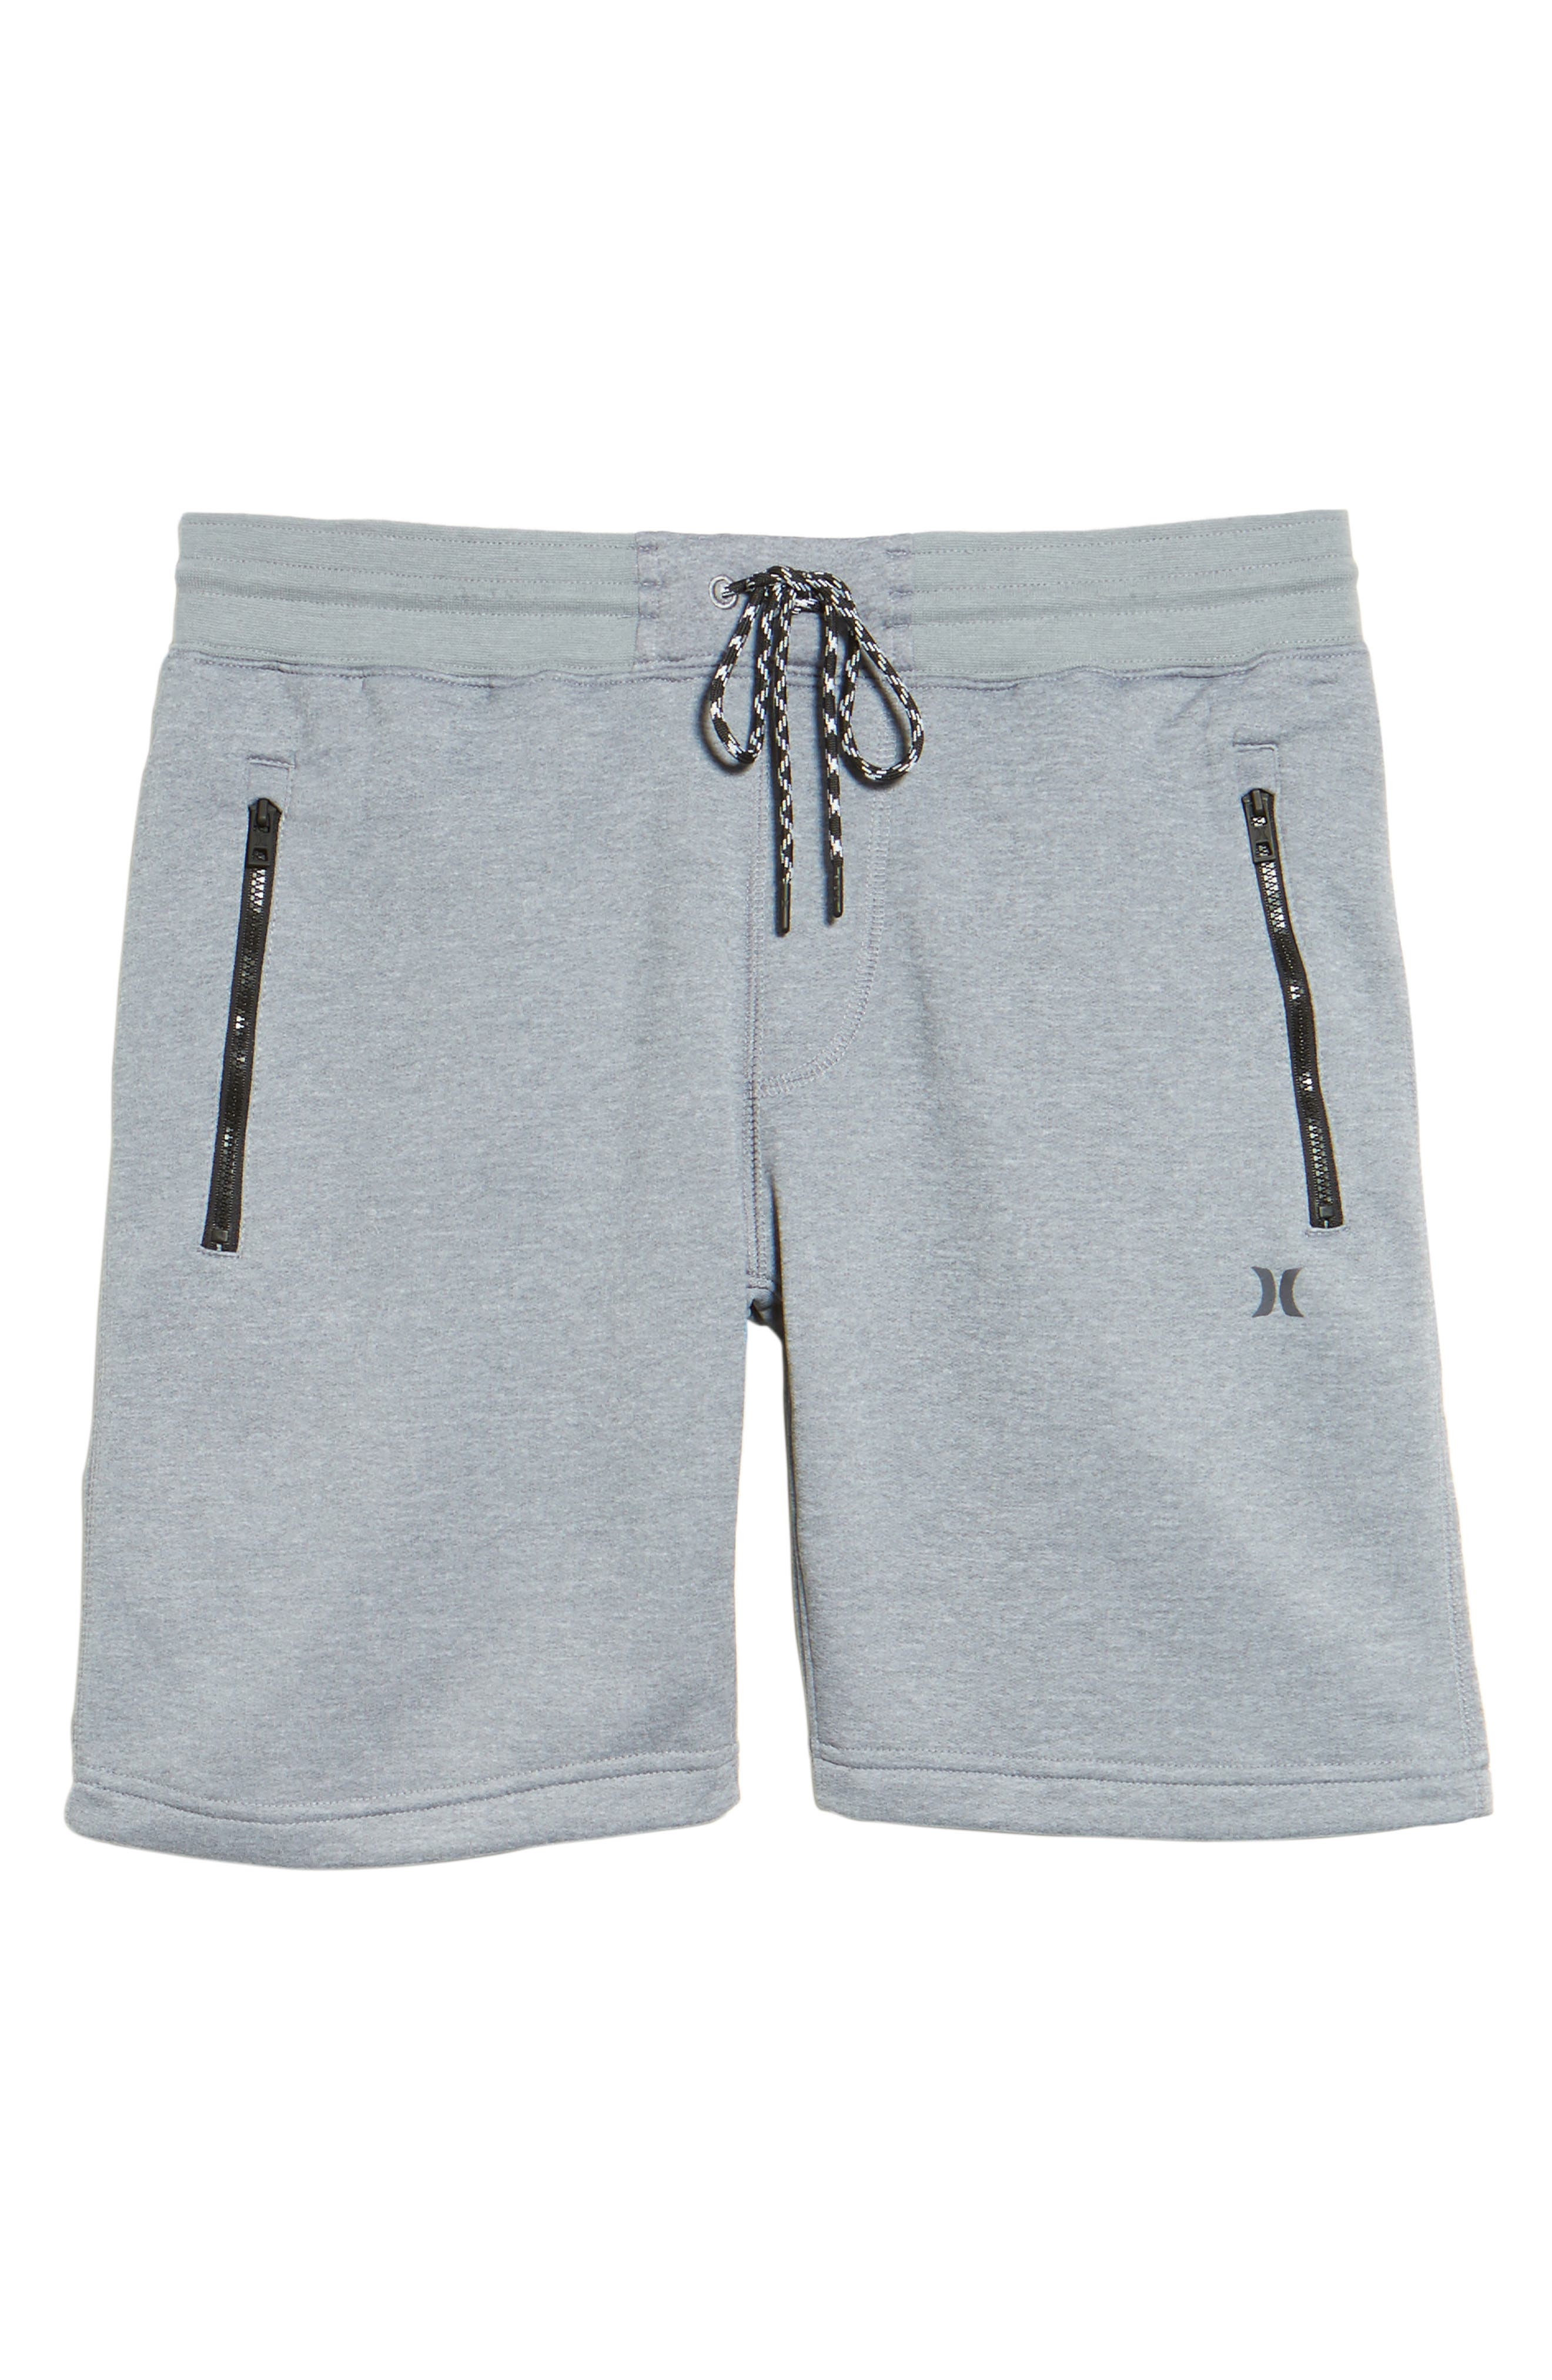 Dri-FIT Solar Shorts,                             Alternate thumbnail 6, color,                             Cool Grey